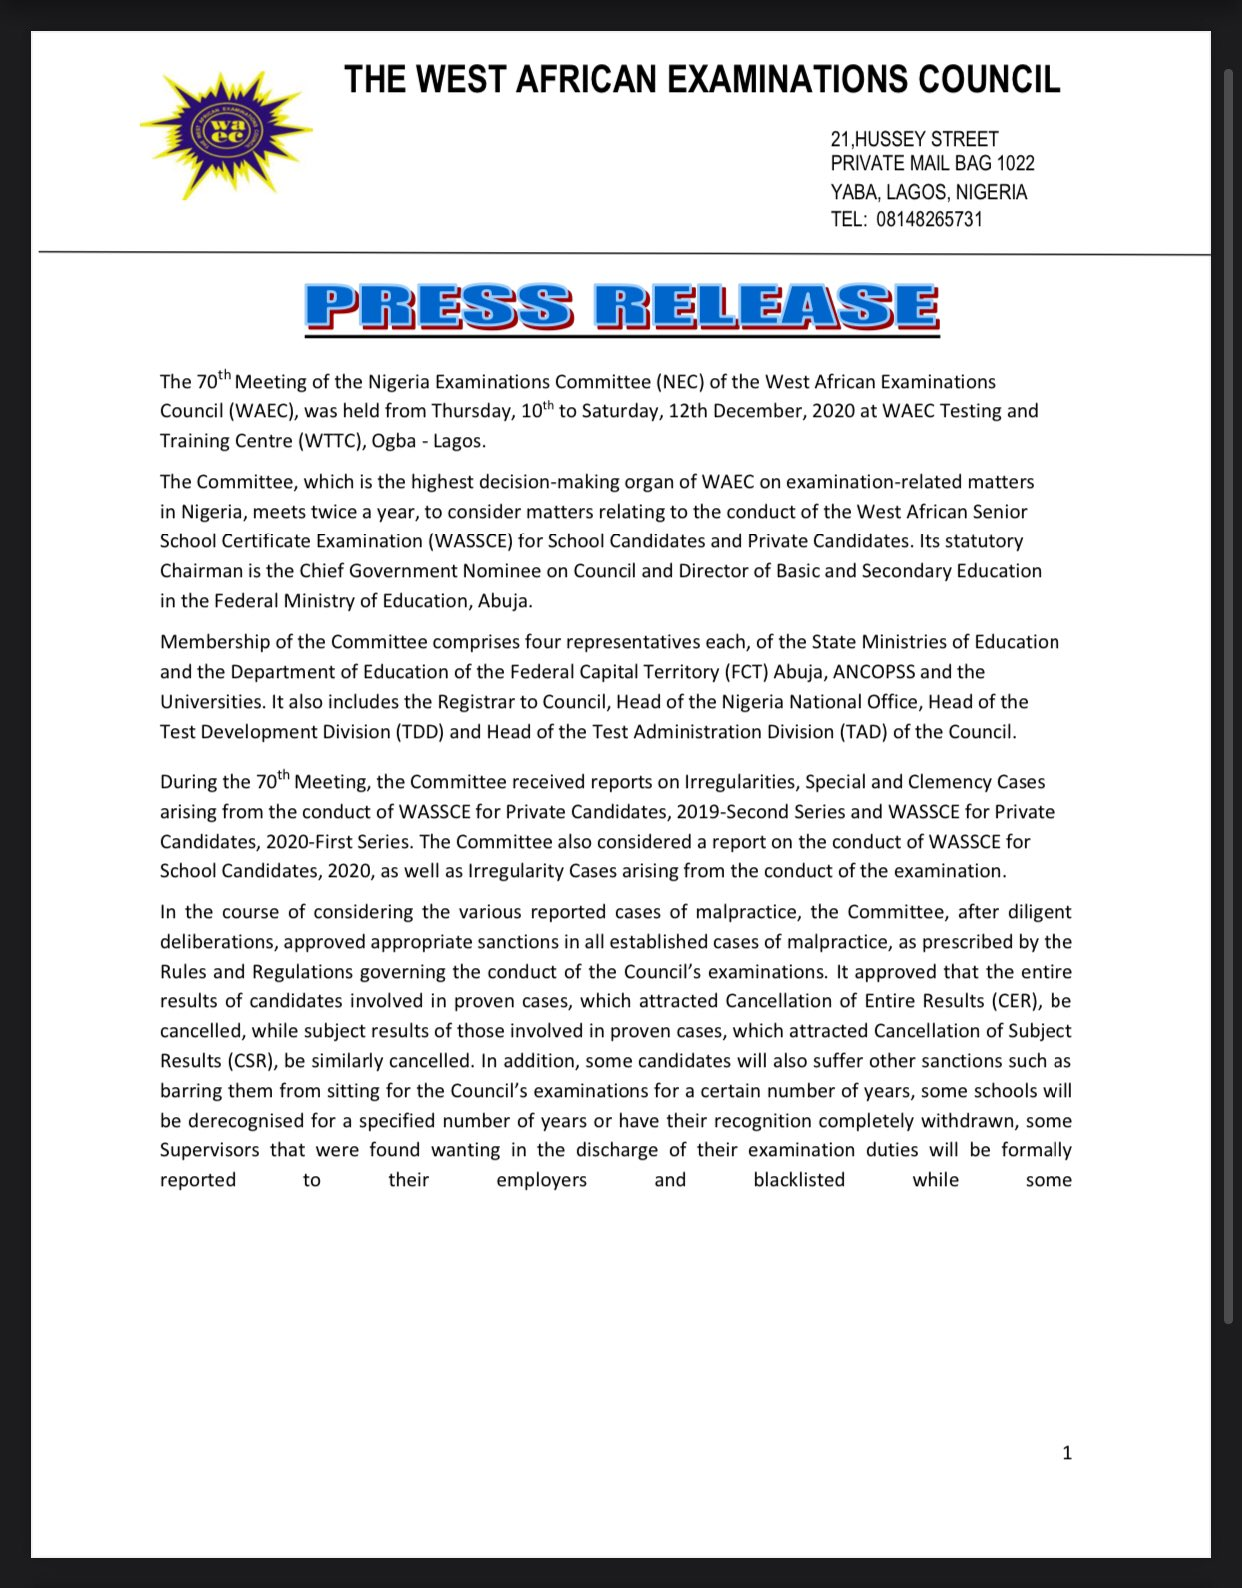 WAEC 70th NEC Meeting Outcome & Press Release 2020